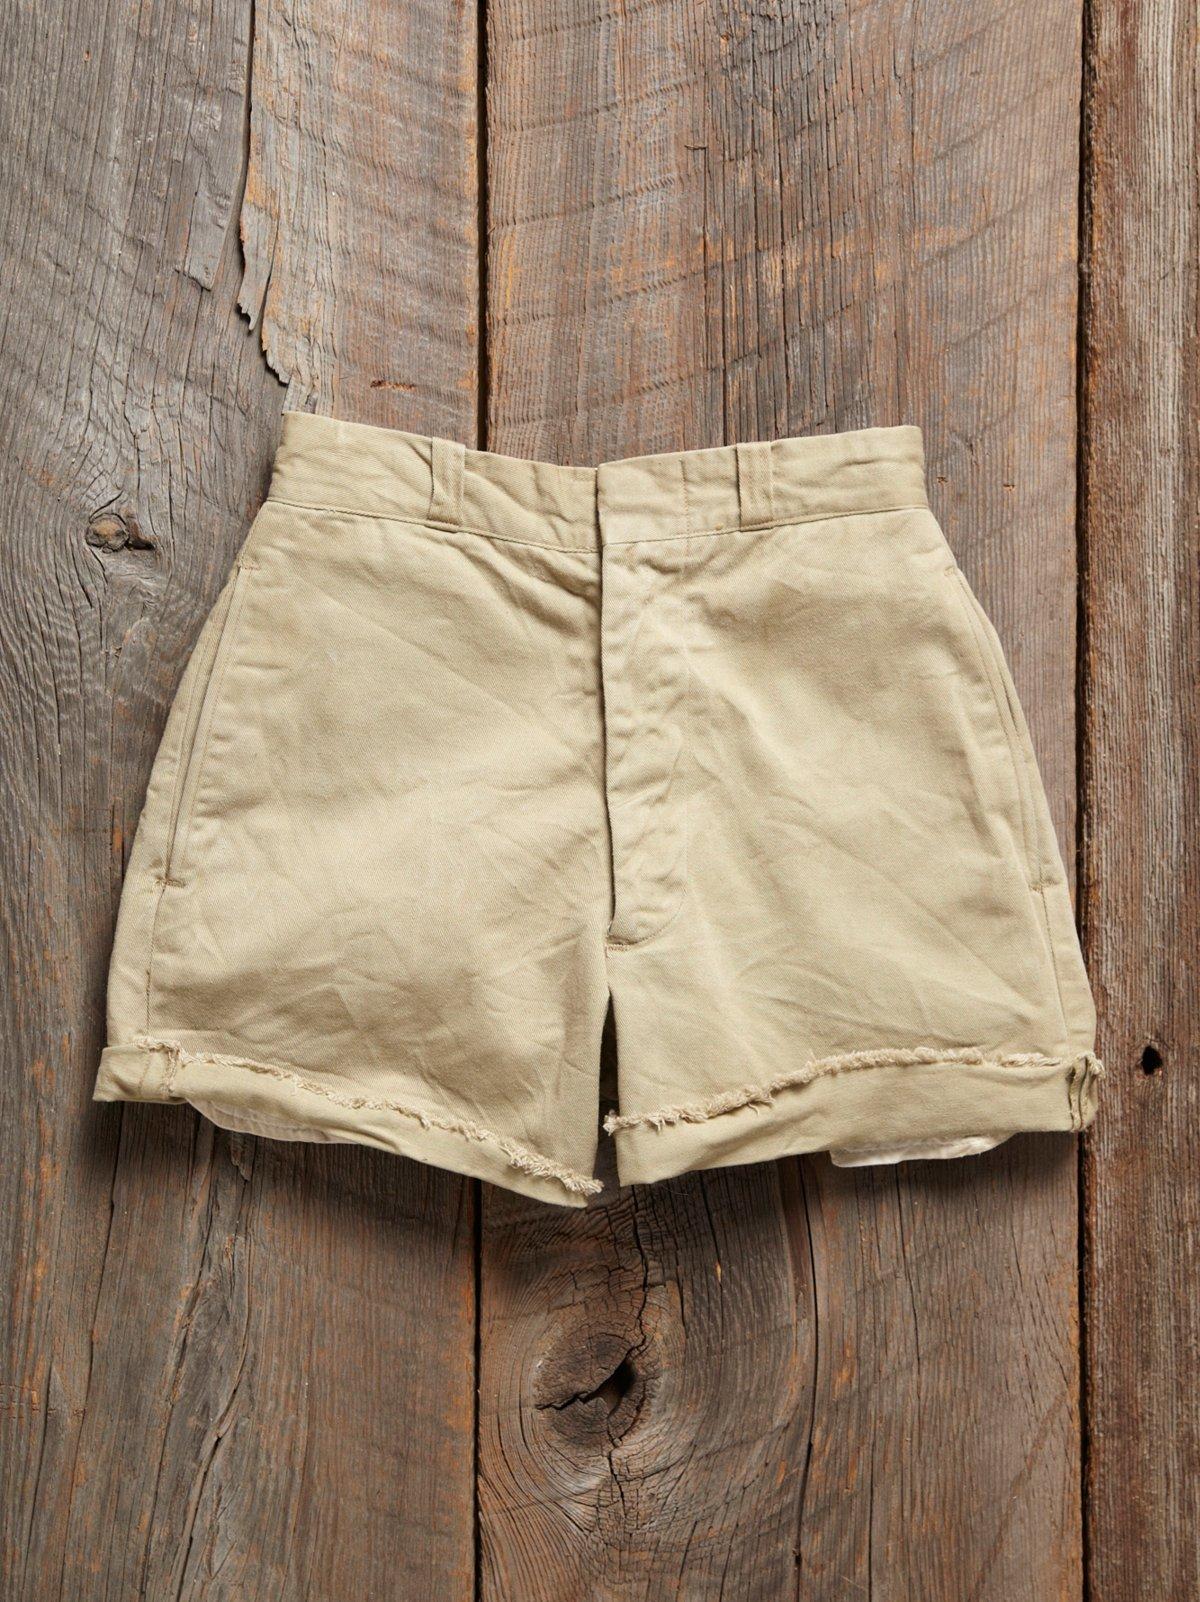 Vintage 1960s Khaki Shorts